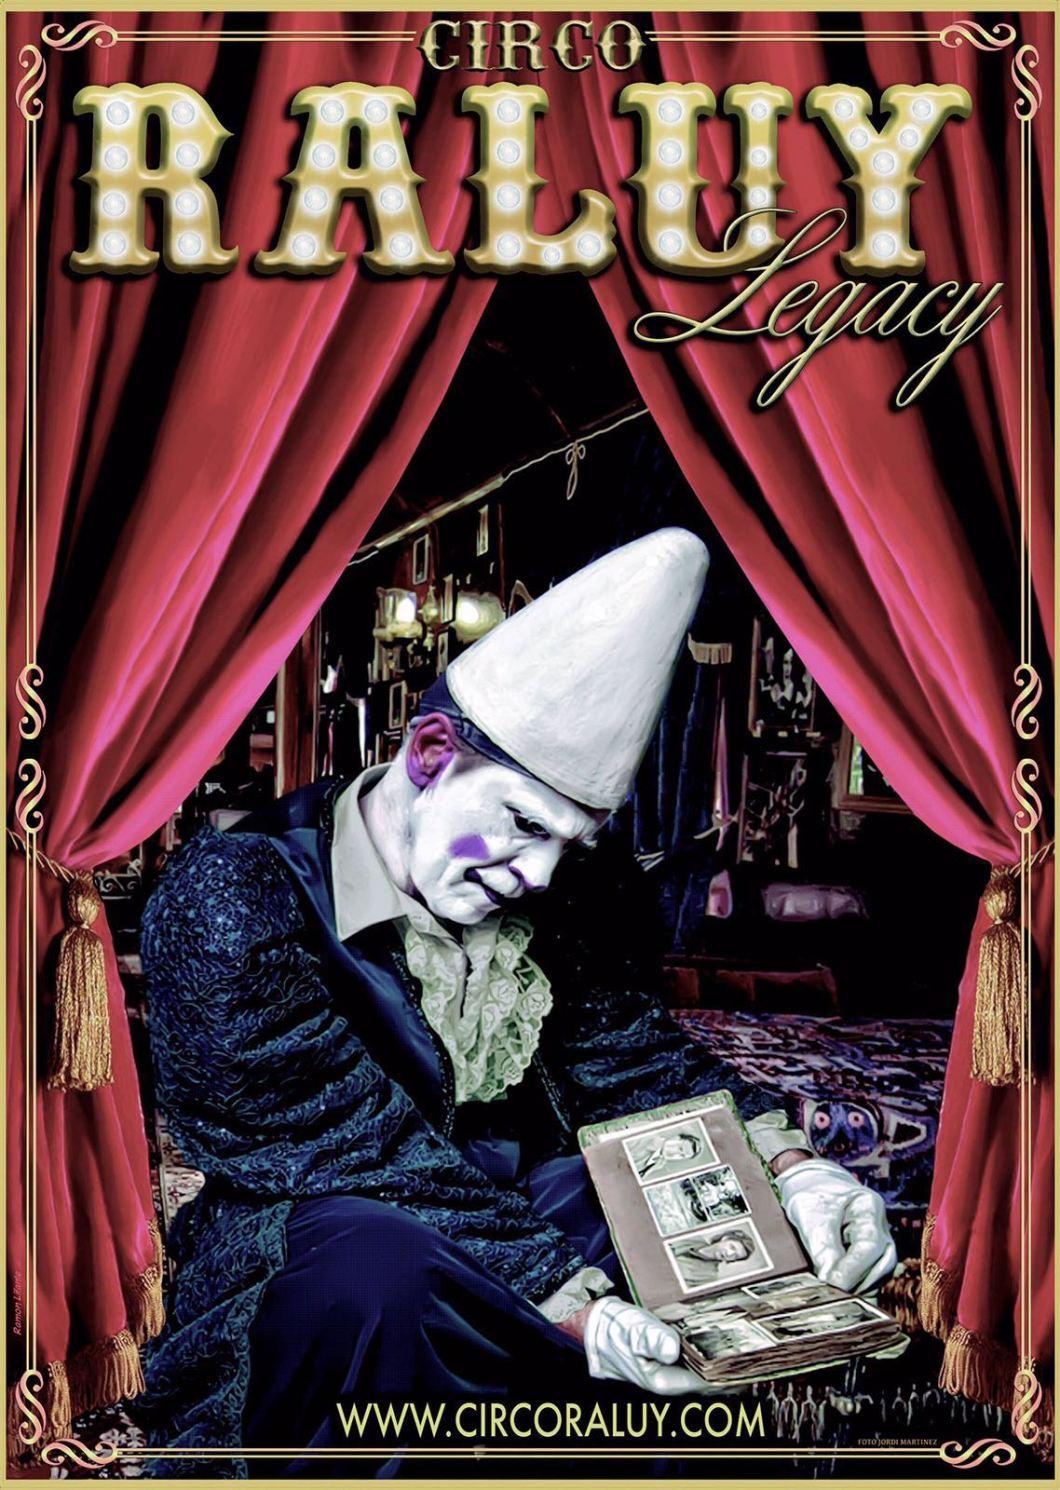 cartel-circo-raluy-legacy-luis-raluy